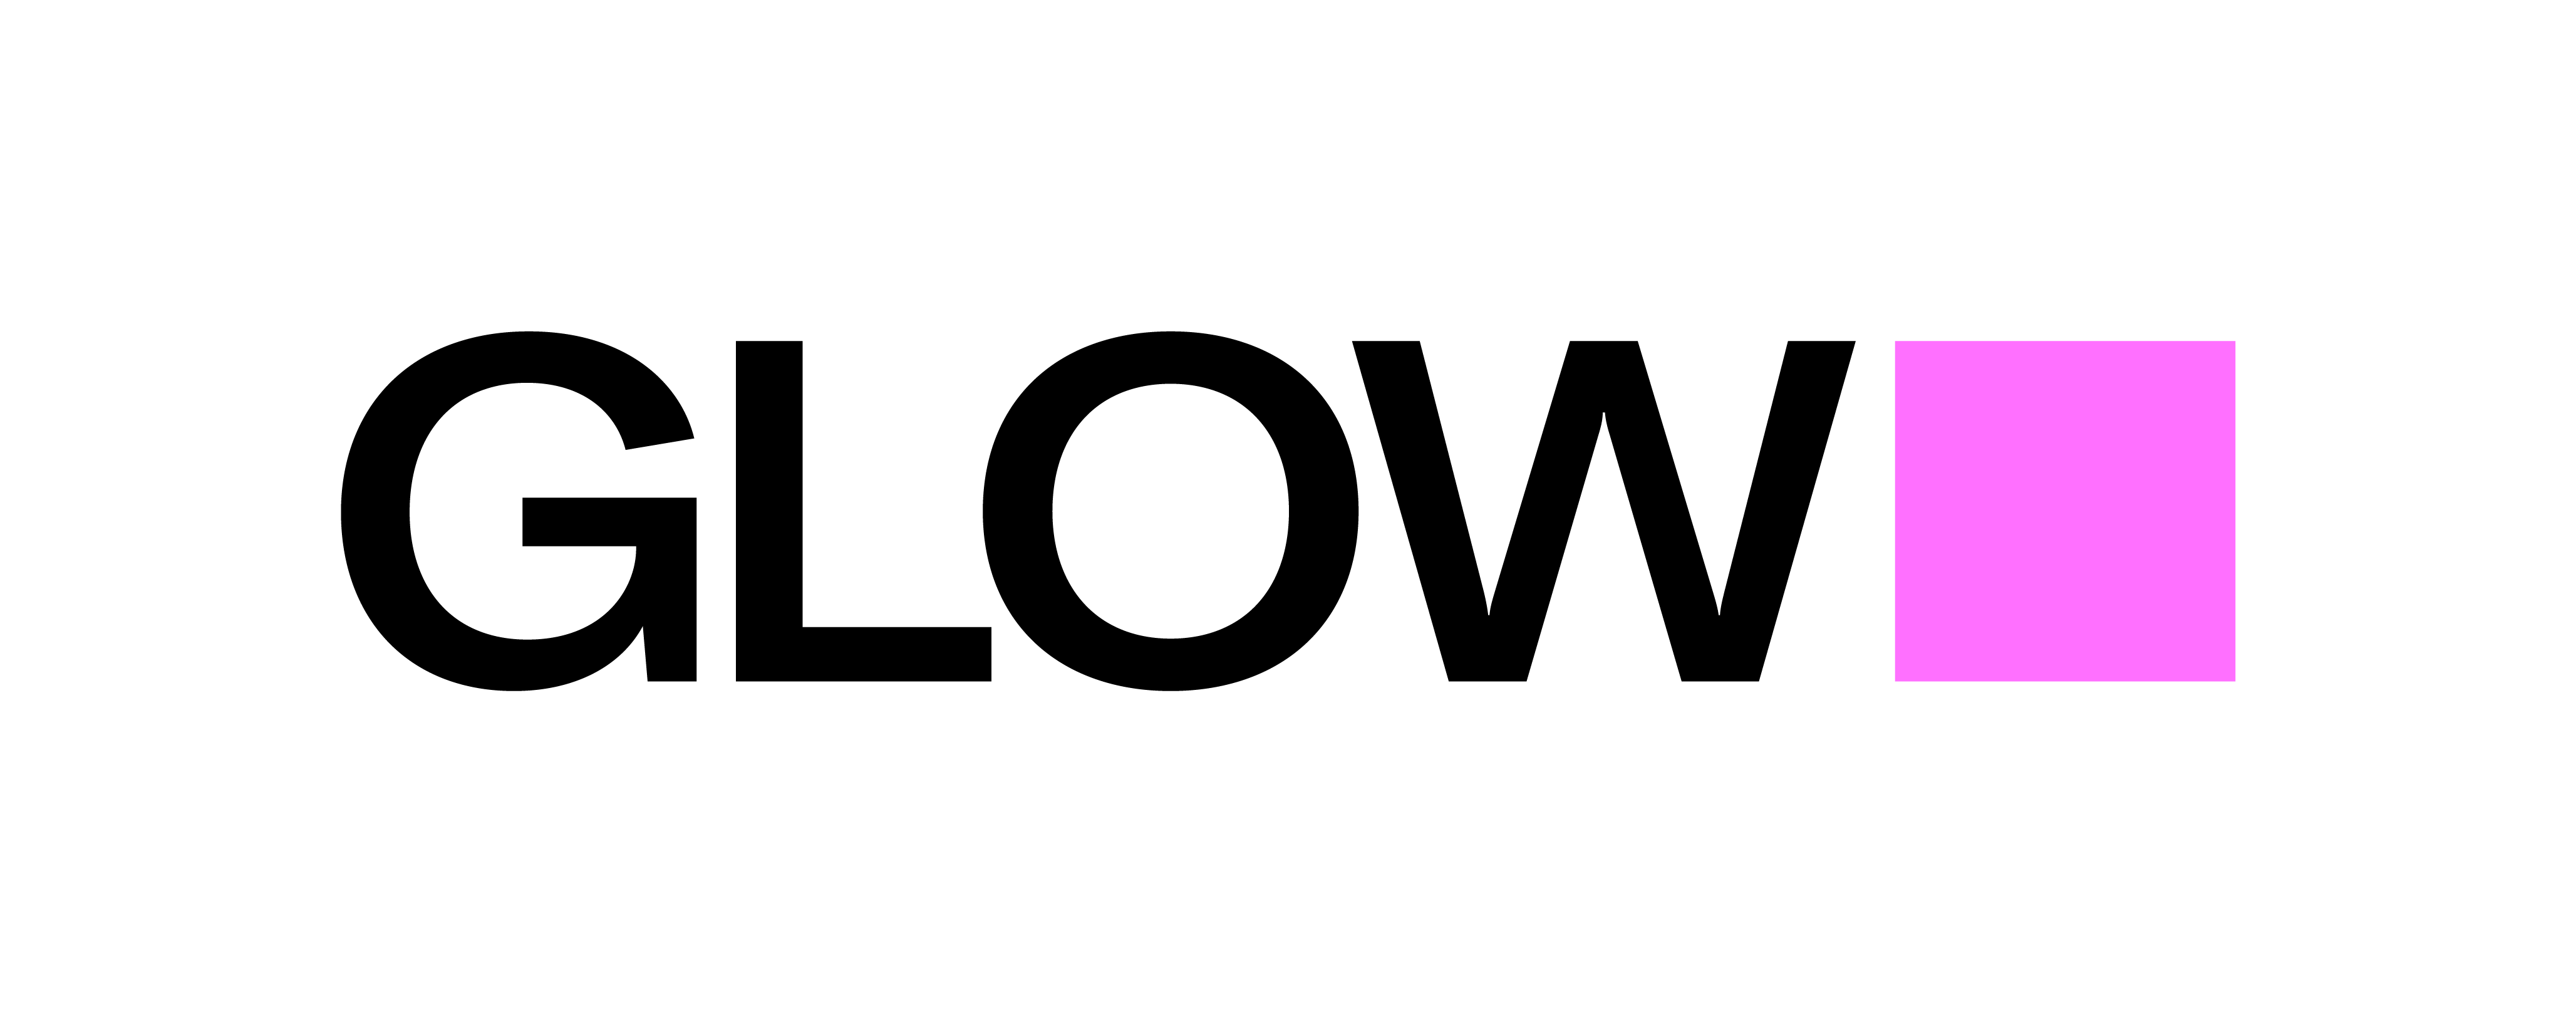 Glow logo - Data4